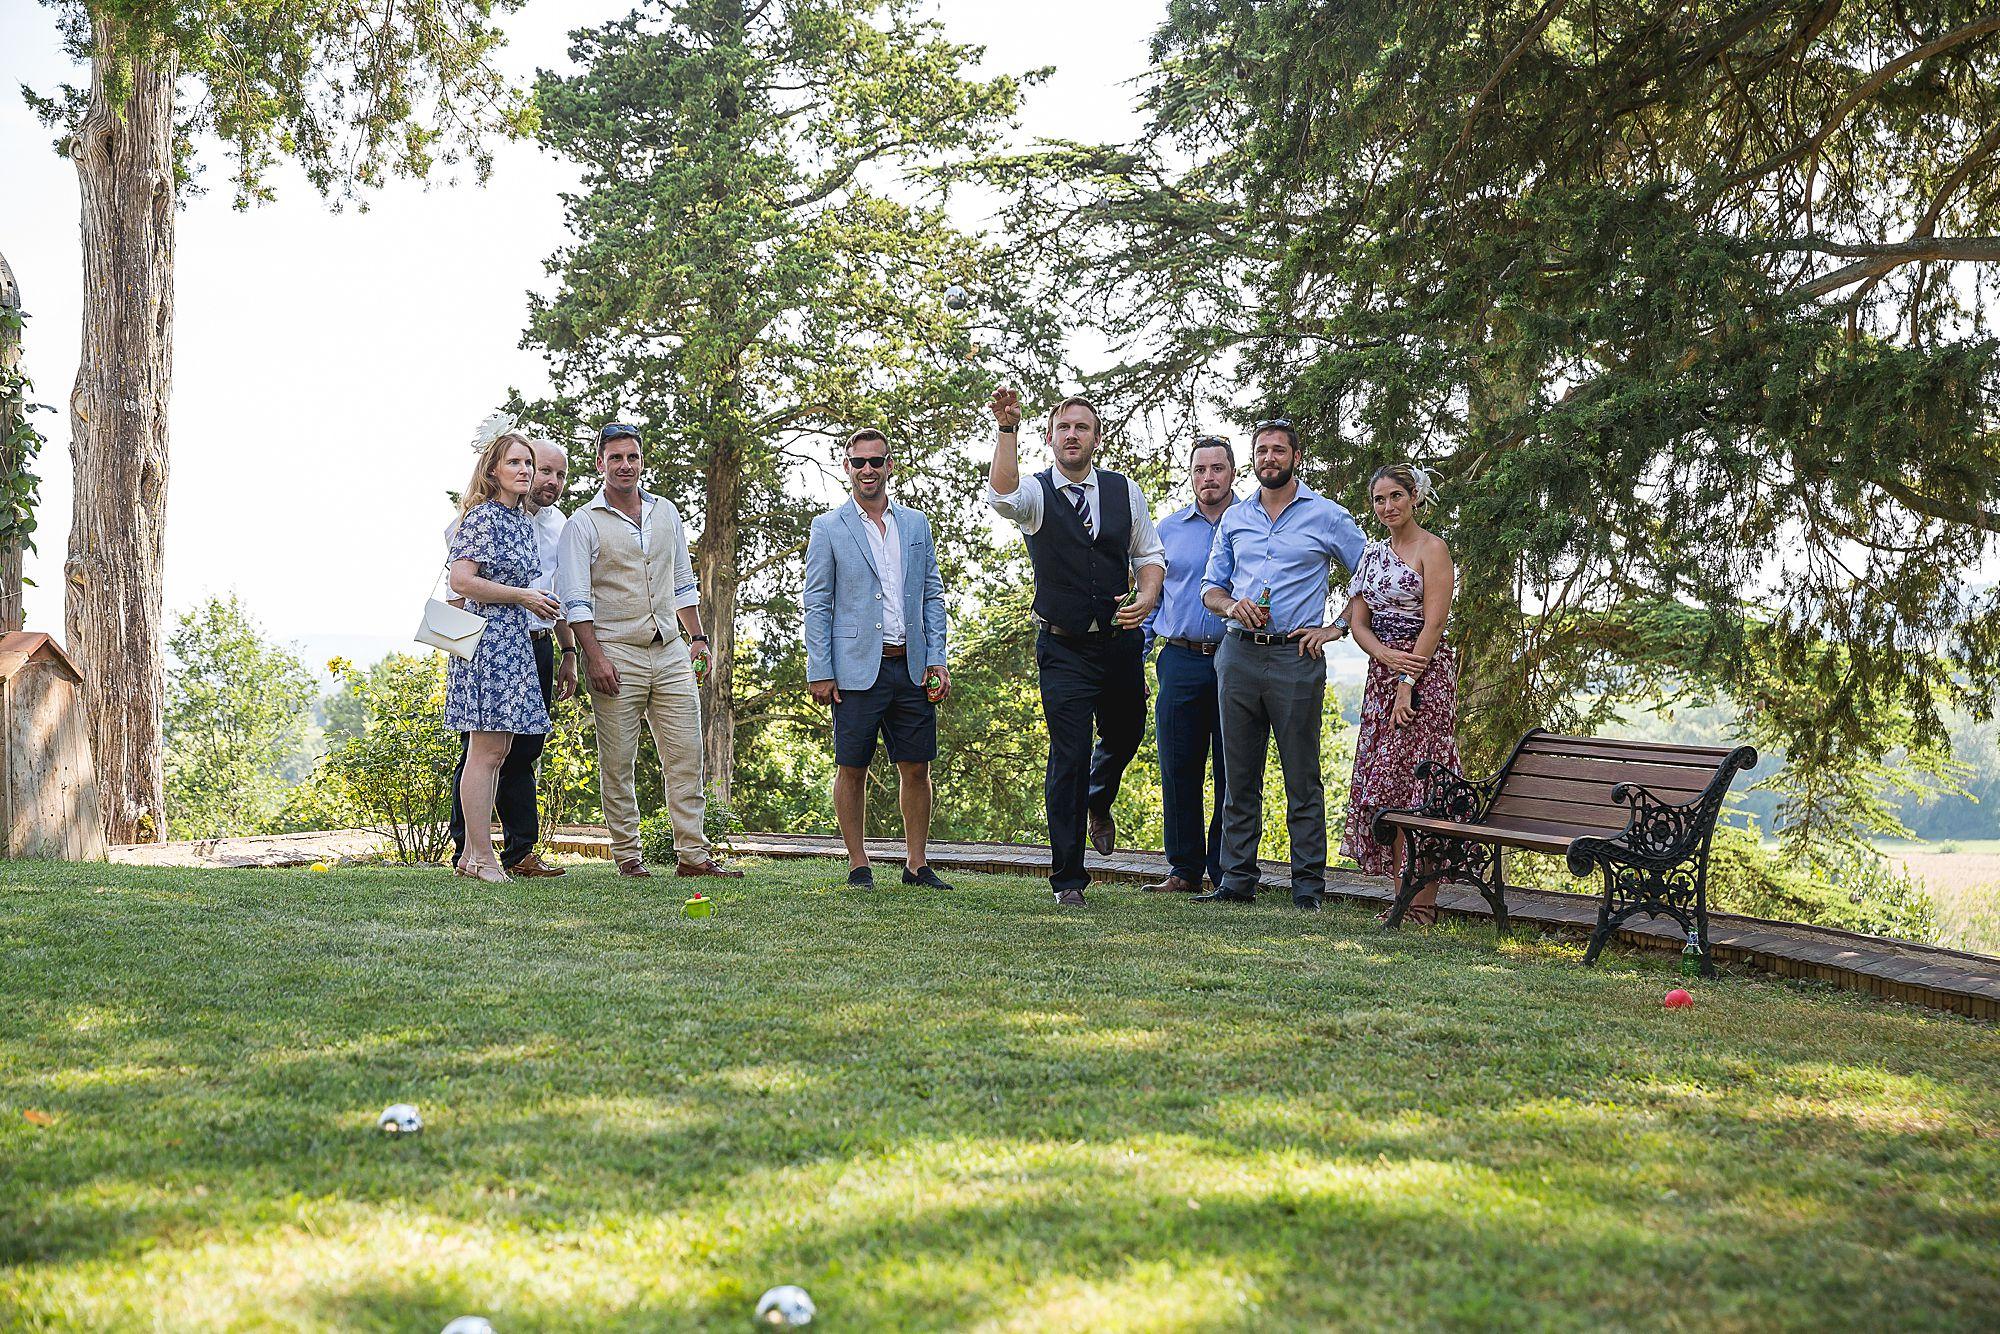 guests play petanque